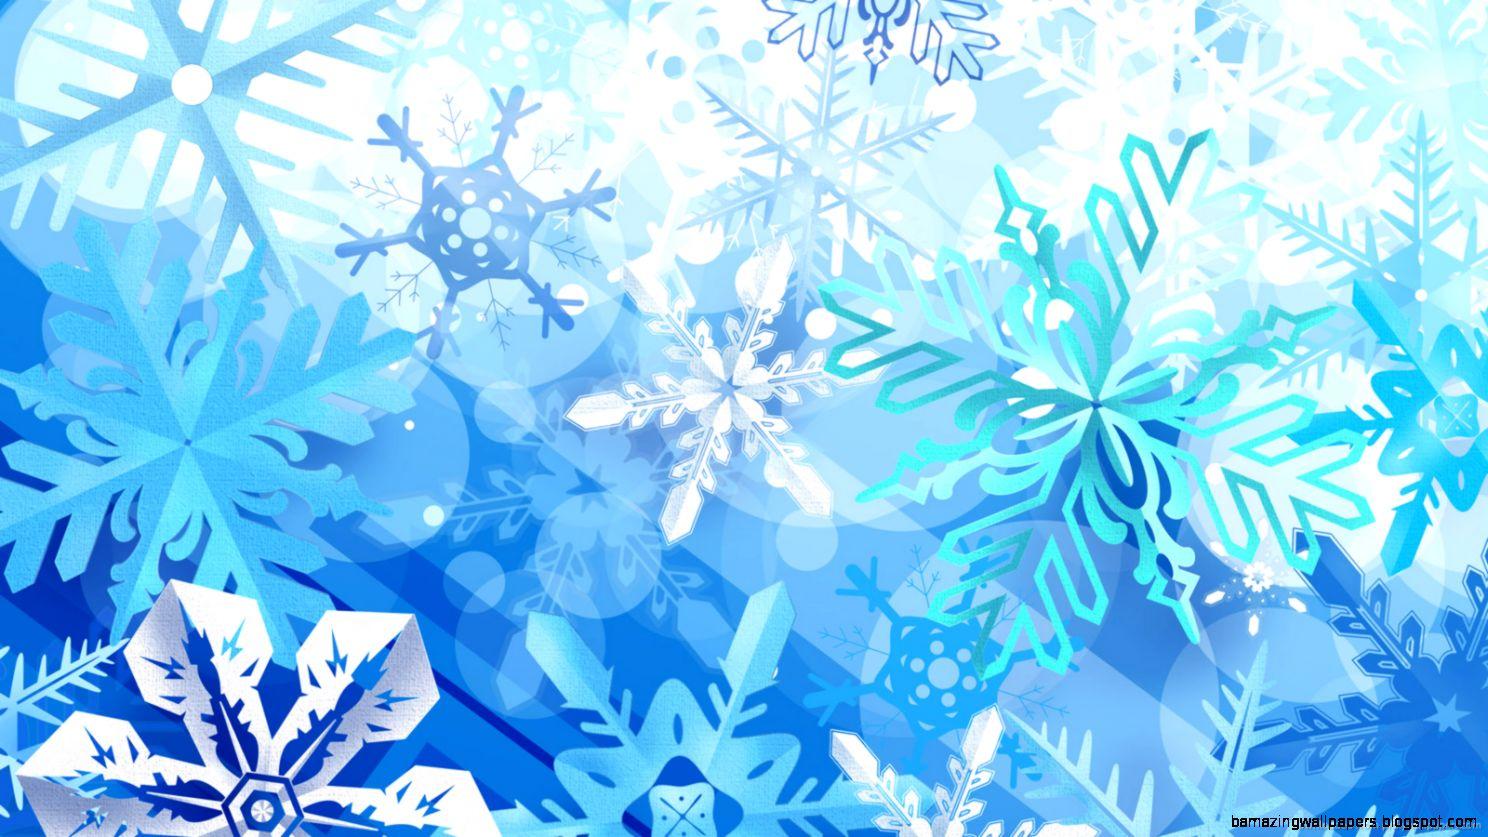 Download 1600x900 Blue Snowflakes Wallpaper